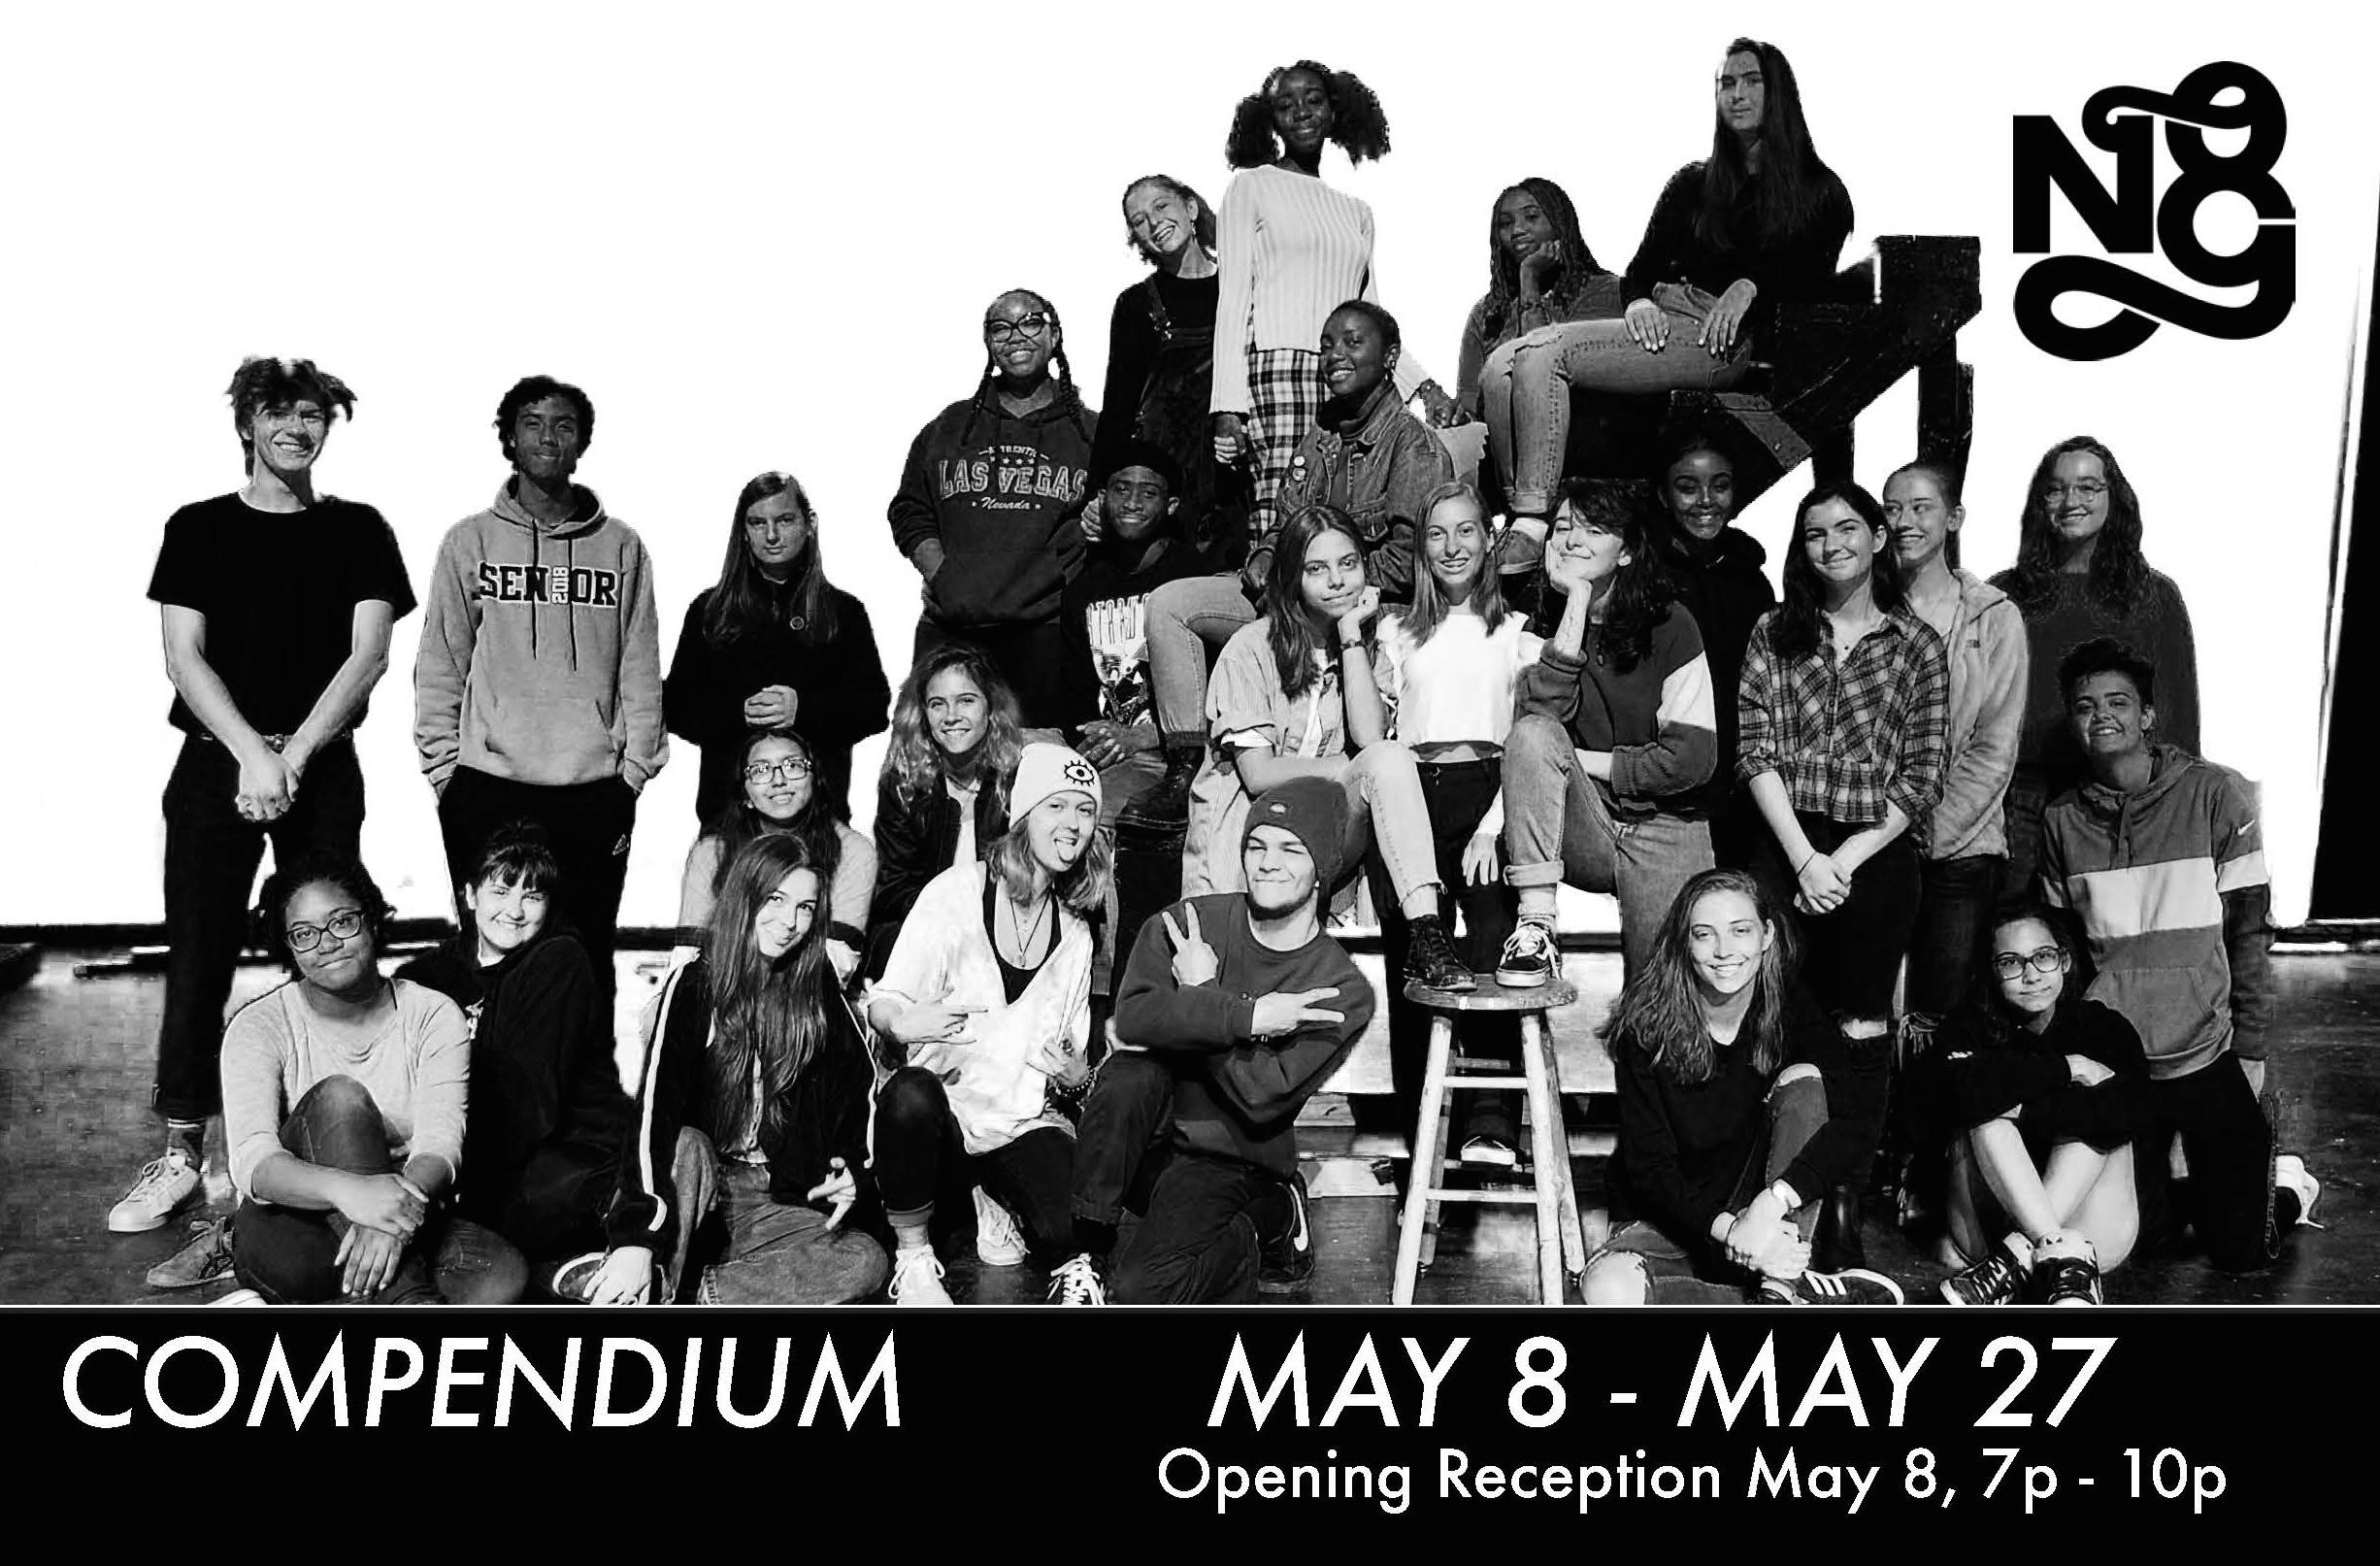 COMPENDIUM - An exhibition of Grady High School Advanced Portfolio Development Students 2018.May 8 - May 27, 2018